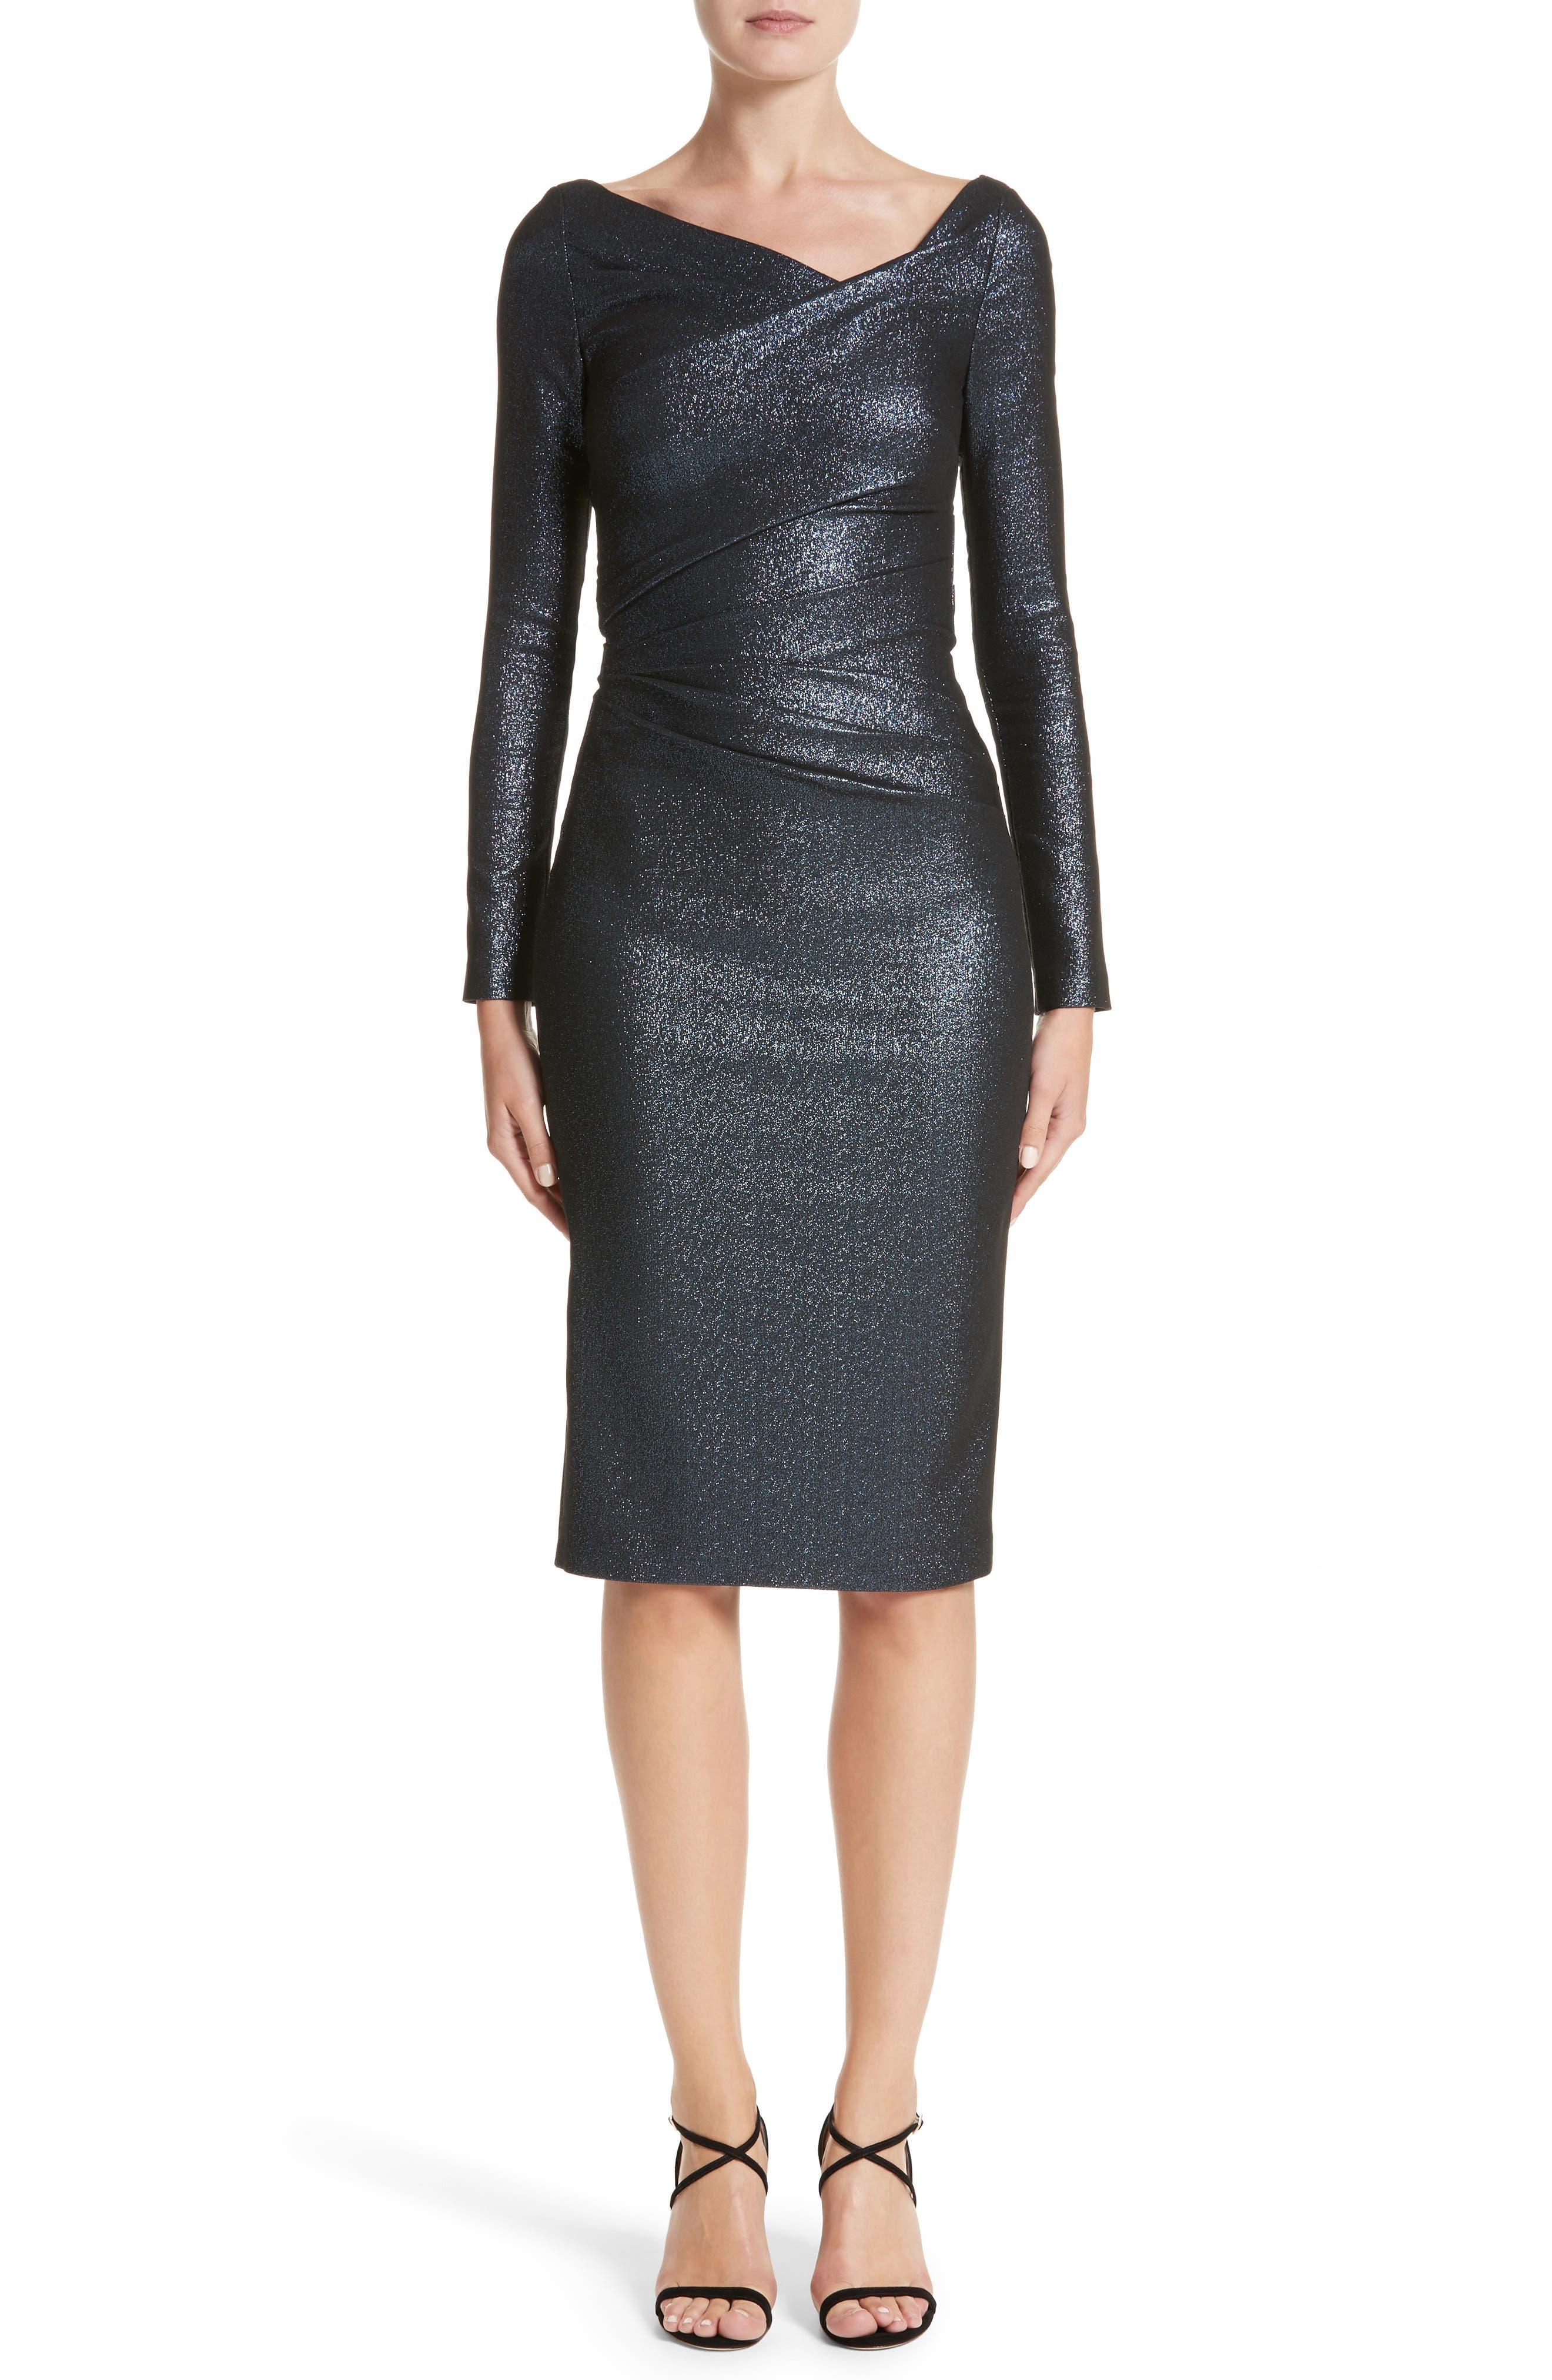 Alternate Image 1 Selected - Talbot Runhof Metallic Asymmetrical Pleat Cocktail Dress